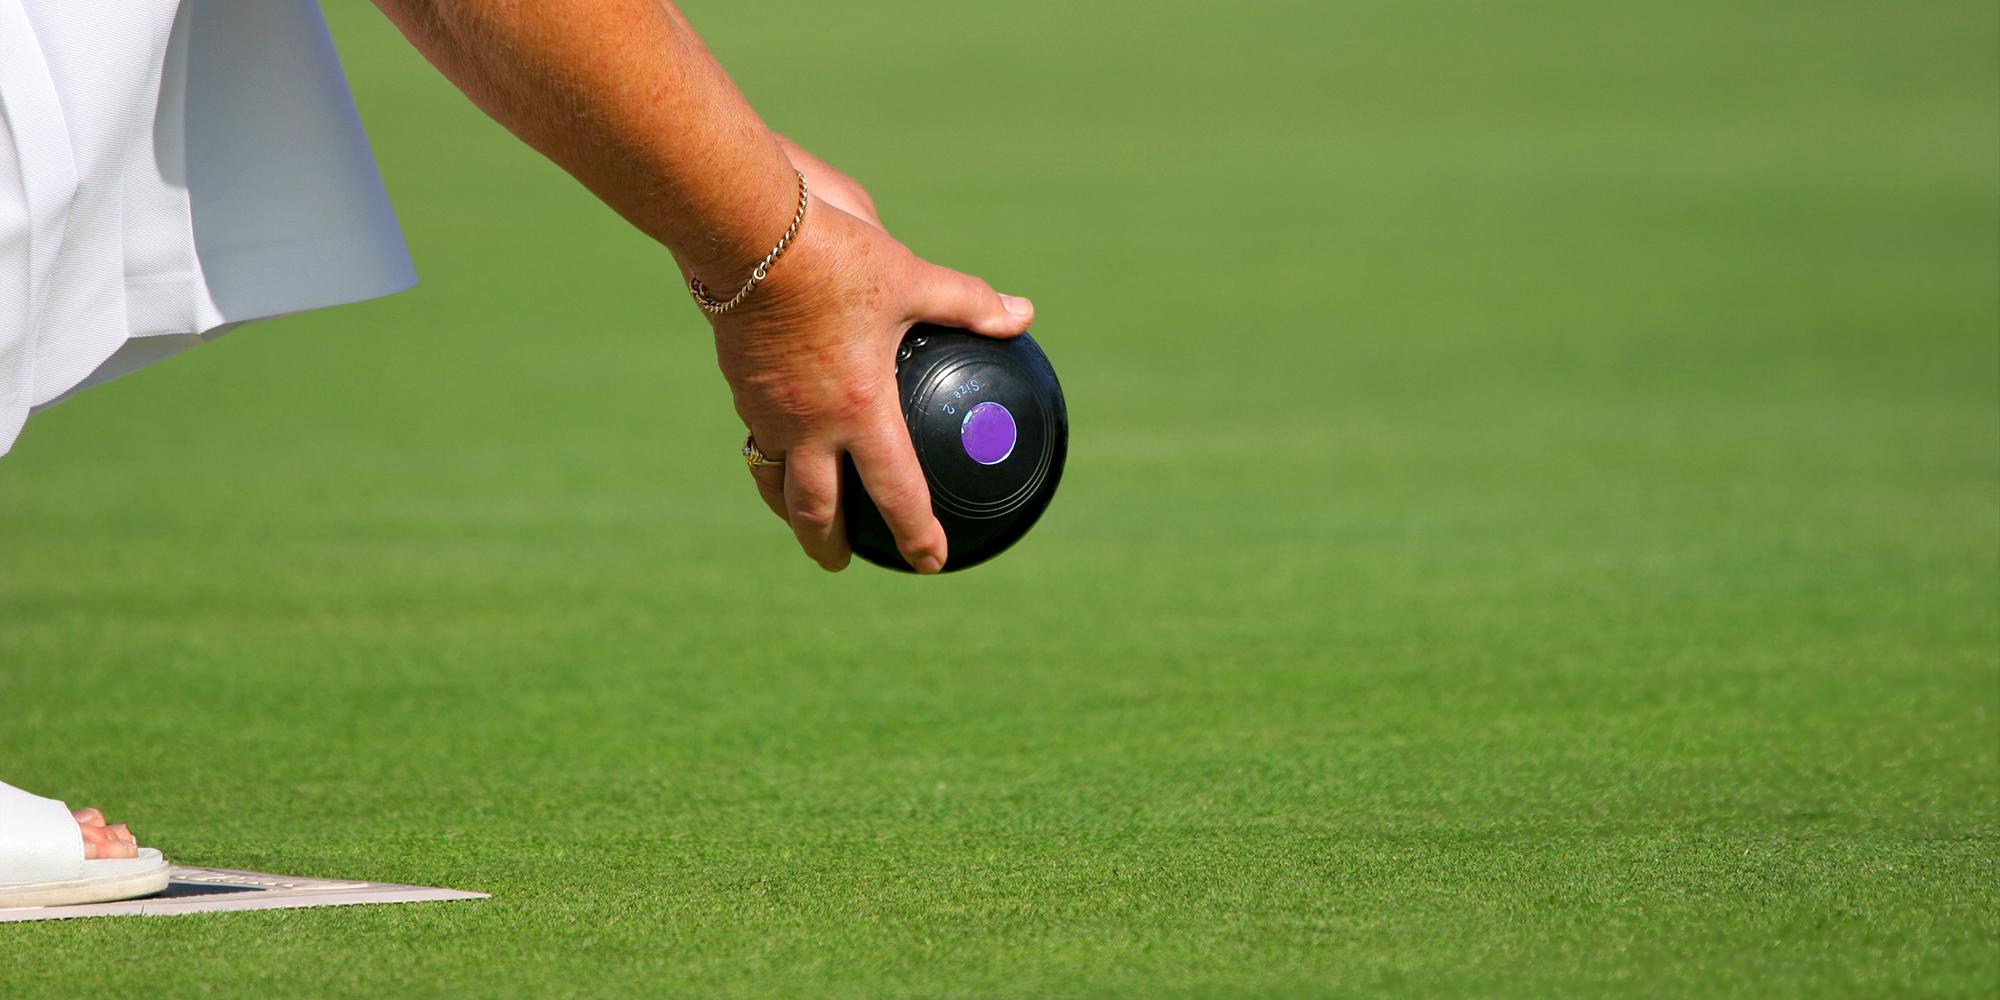 Welford Bowls Club outdoor bowls